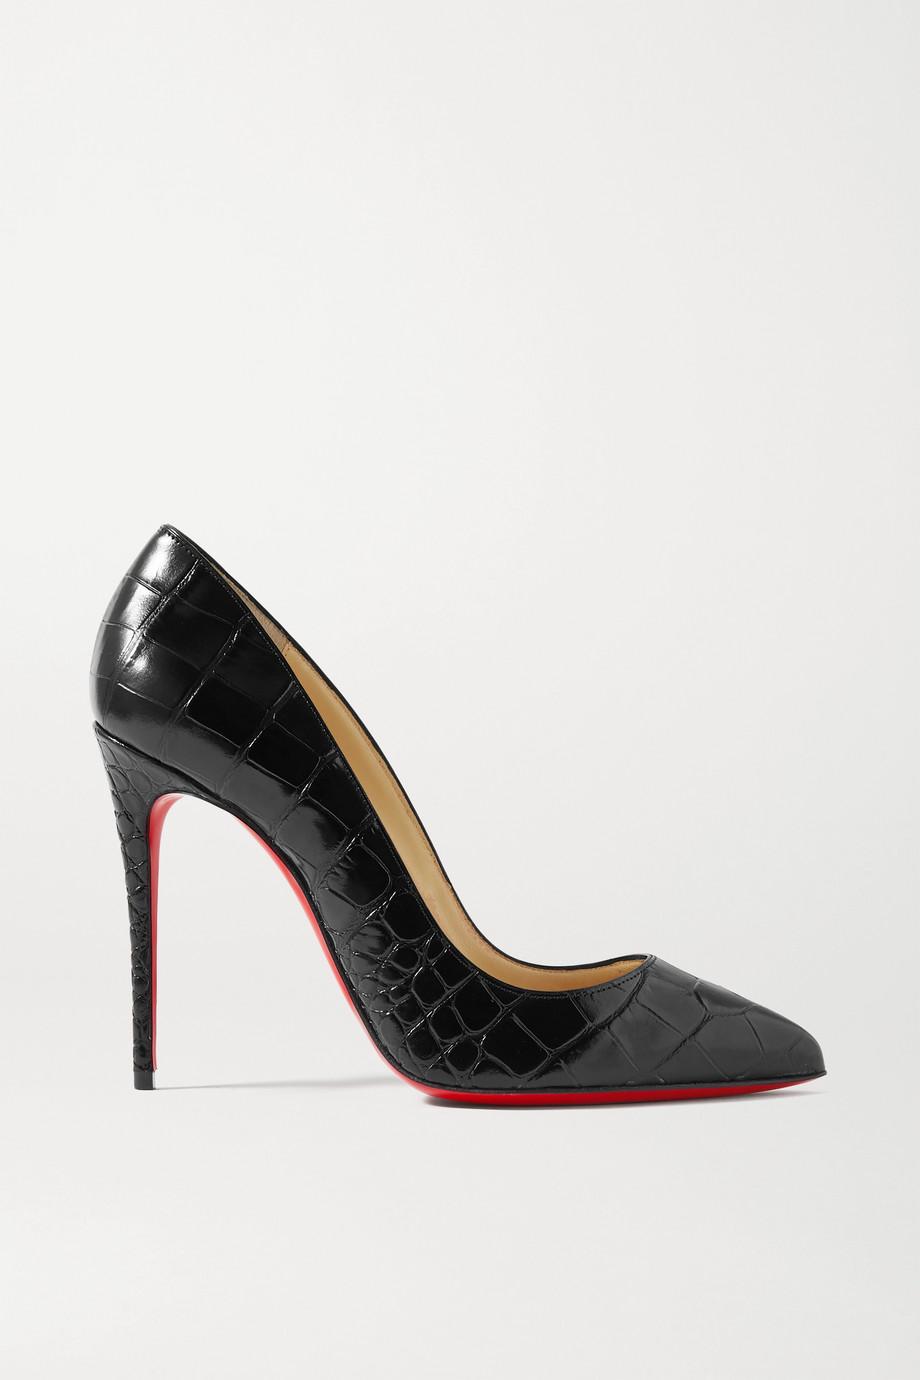 Christian Louboutin Pigalle Follies 100 仿鳄鱼纹皮革高跟鞋